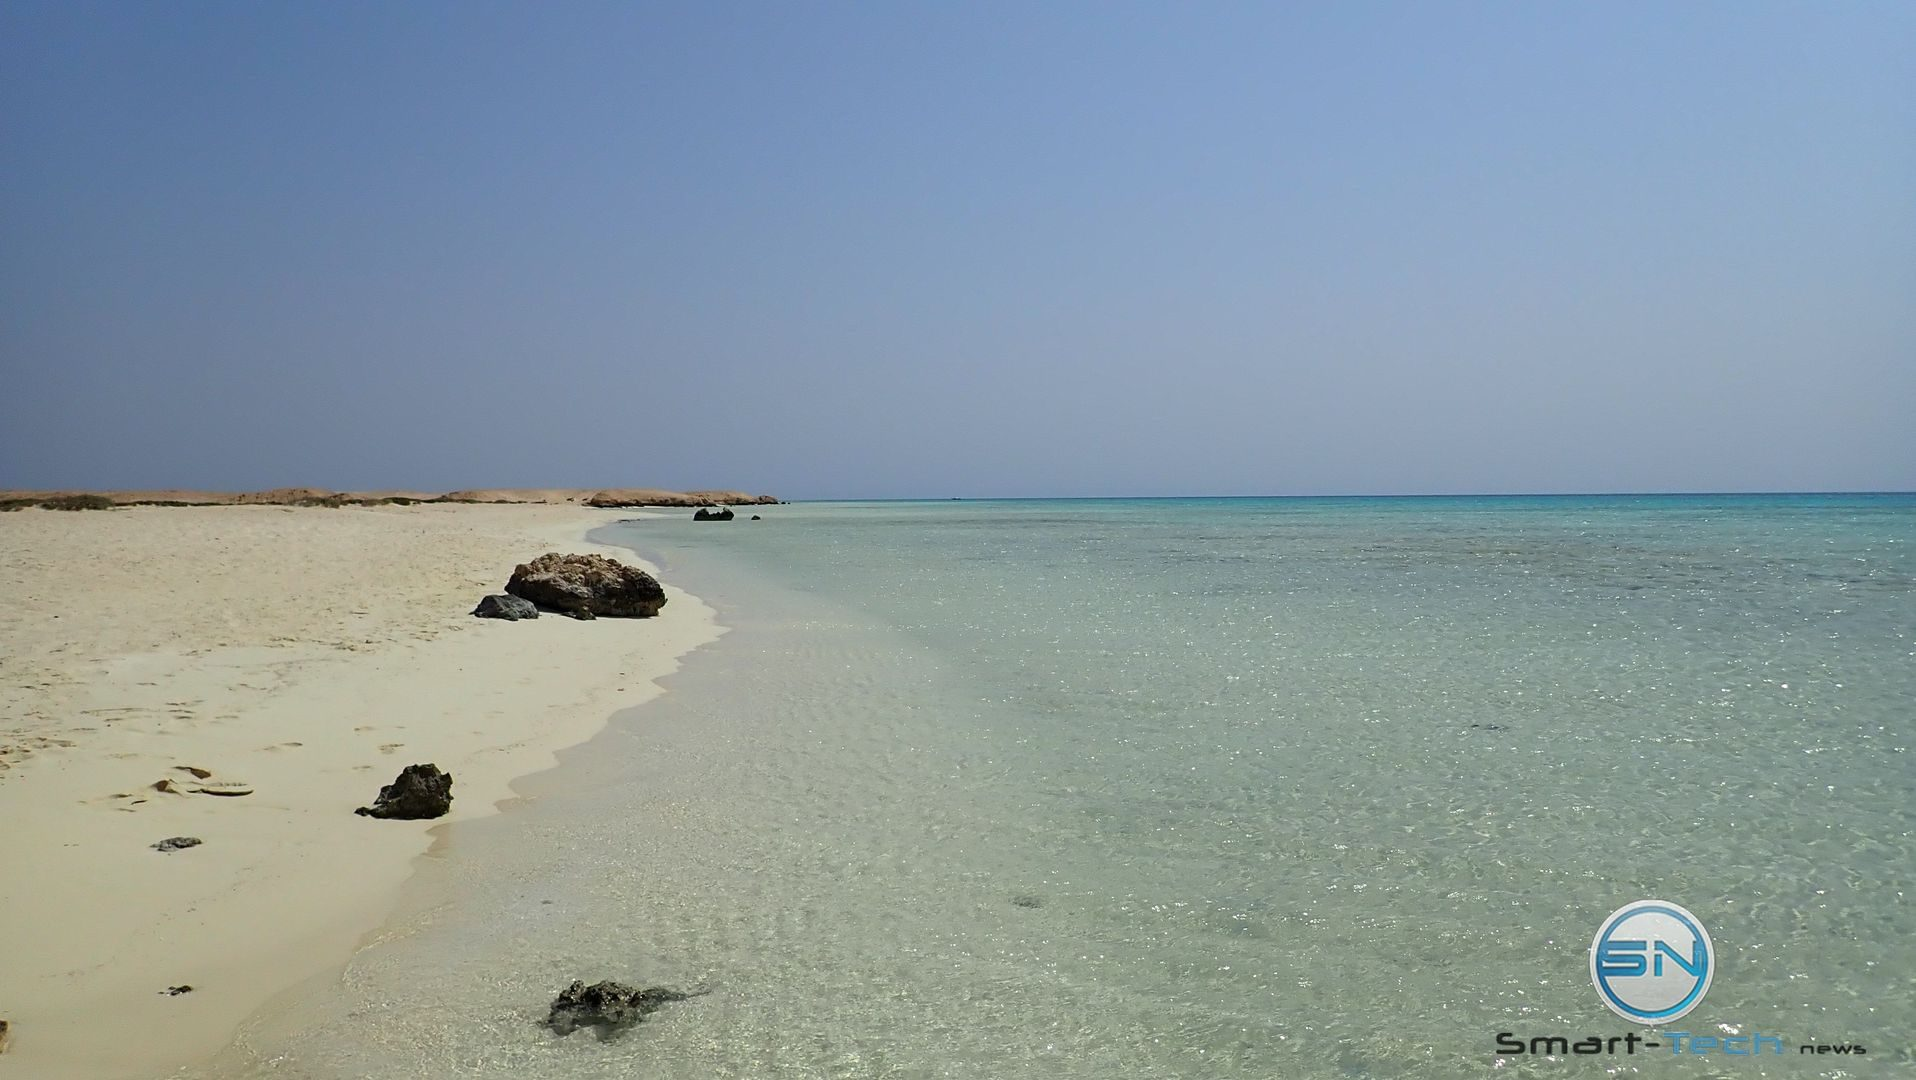 Beach-Dreaming Egypt- Olympus TG5